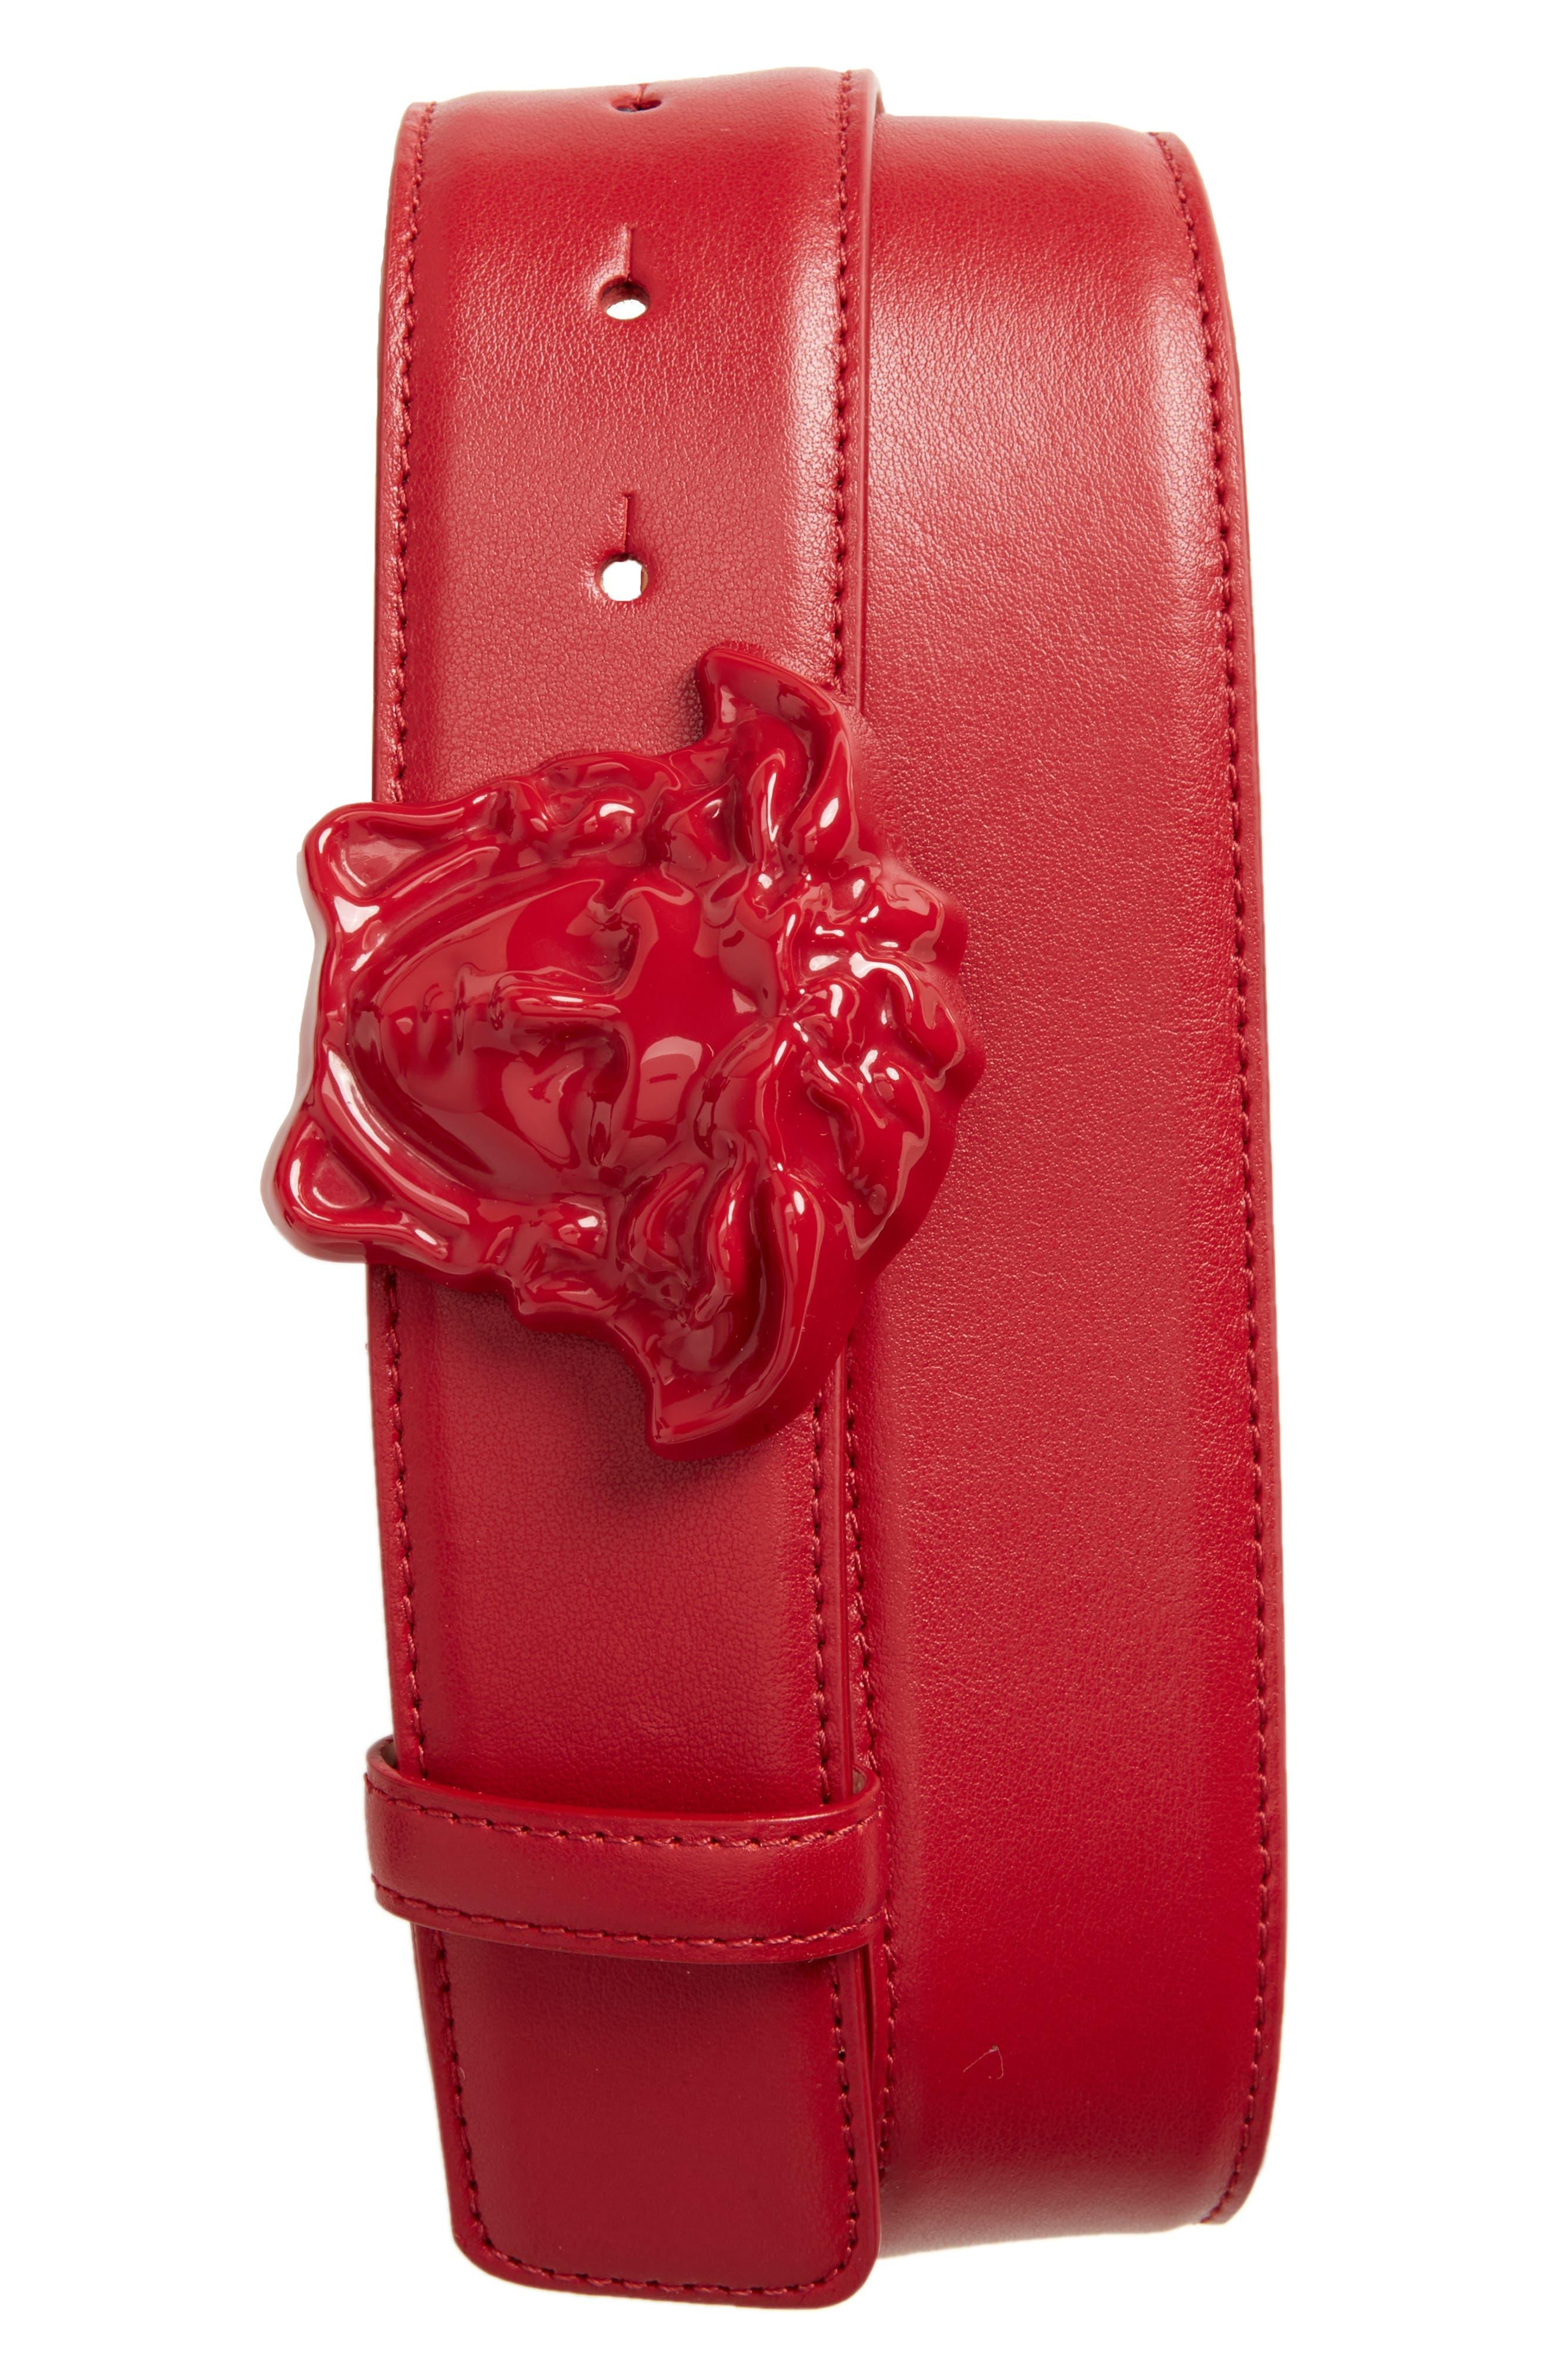 Main Image - Versace First Line Medusa Head Leather Belt